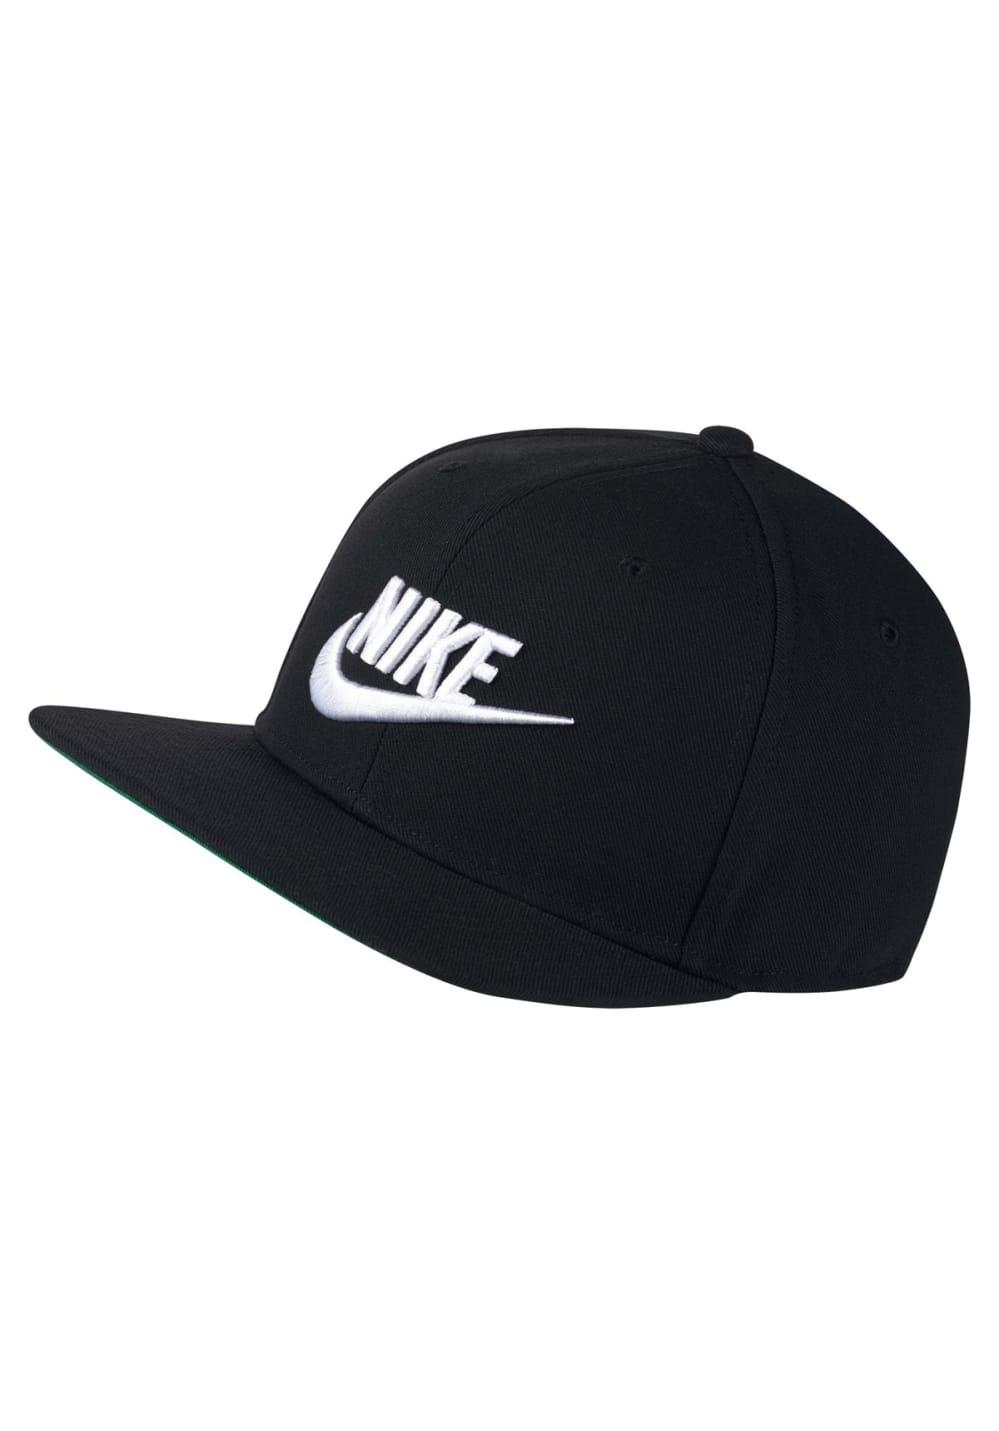 Nike Sportswear Pro Cap Kopfbedeckung - Schwarz